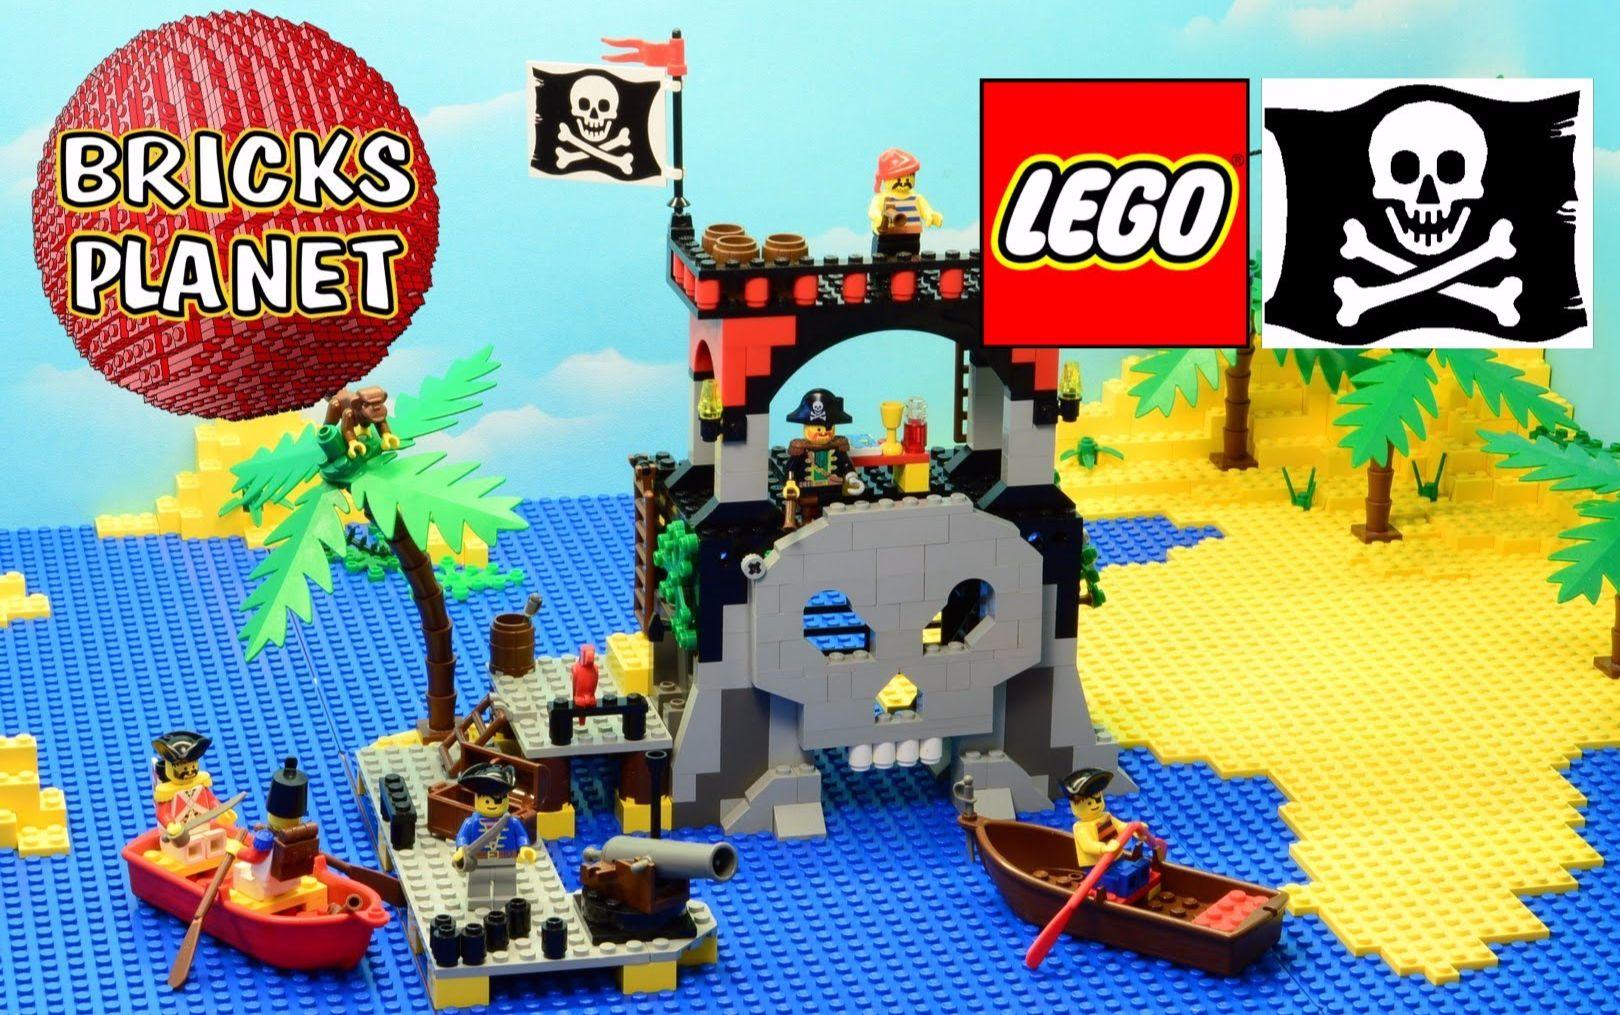 【LEGO】经典回顾-海盗?#30423;?279 Skull Island(骷髅岛1995)